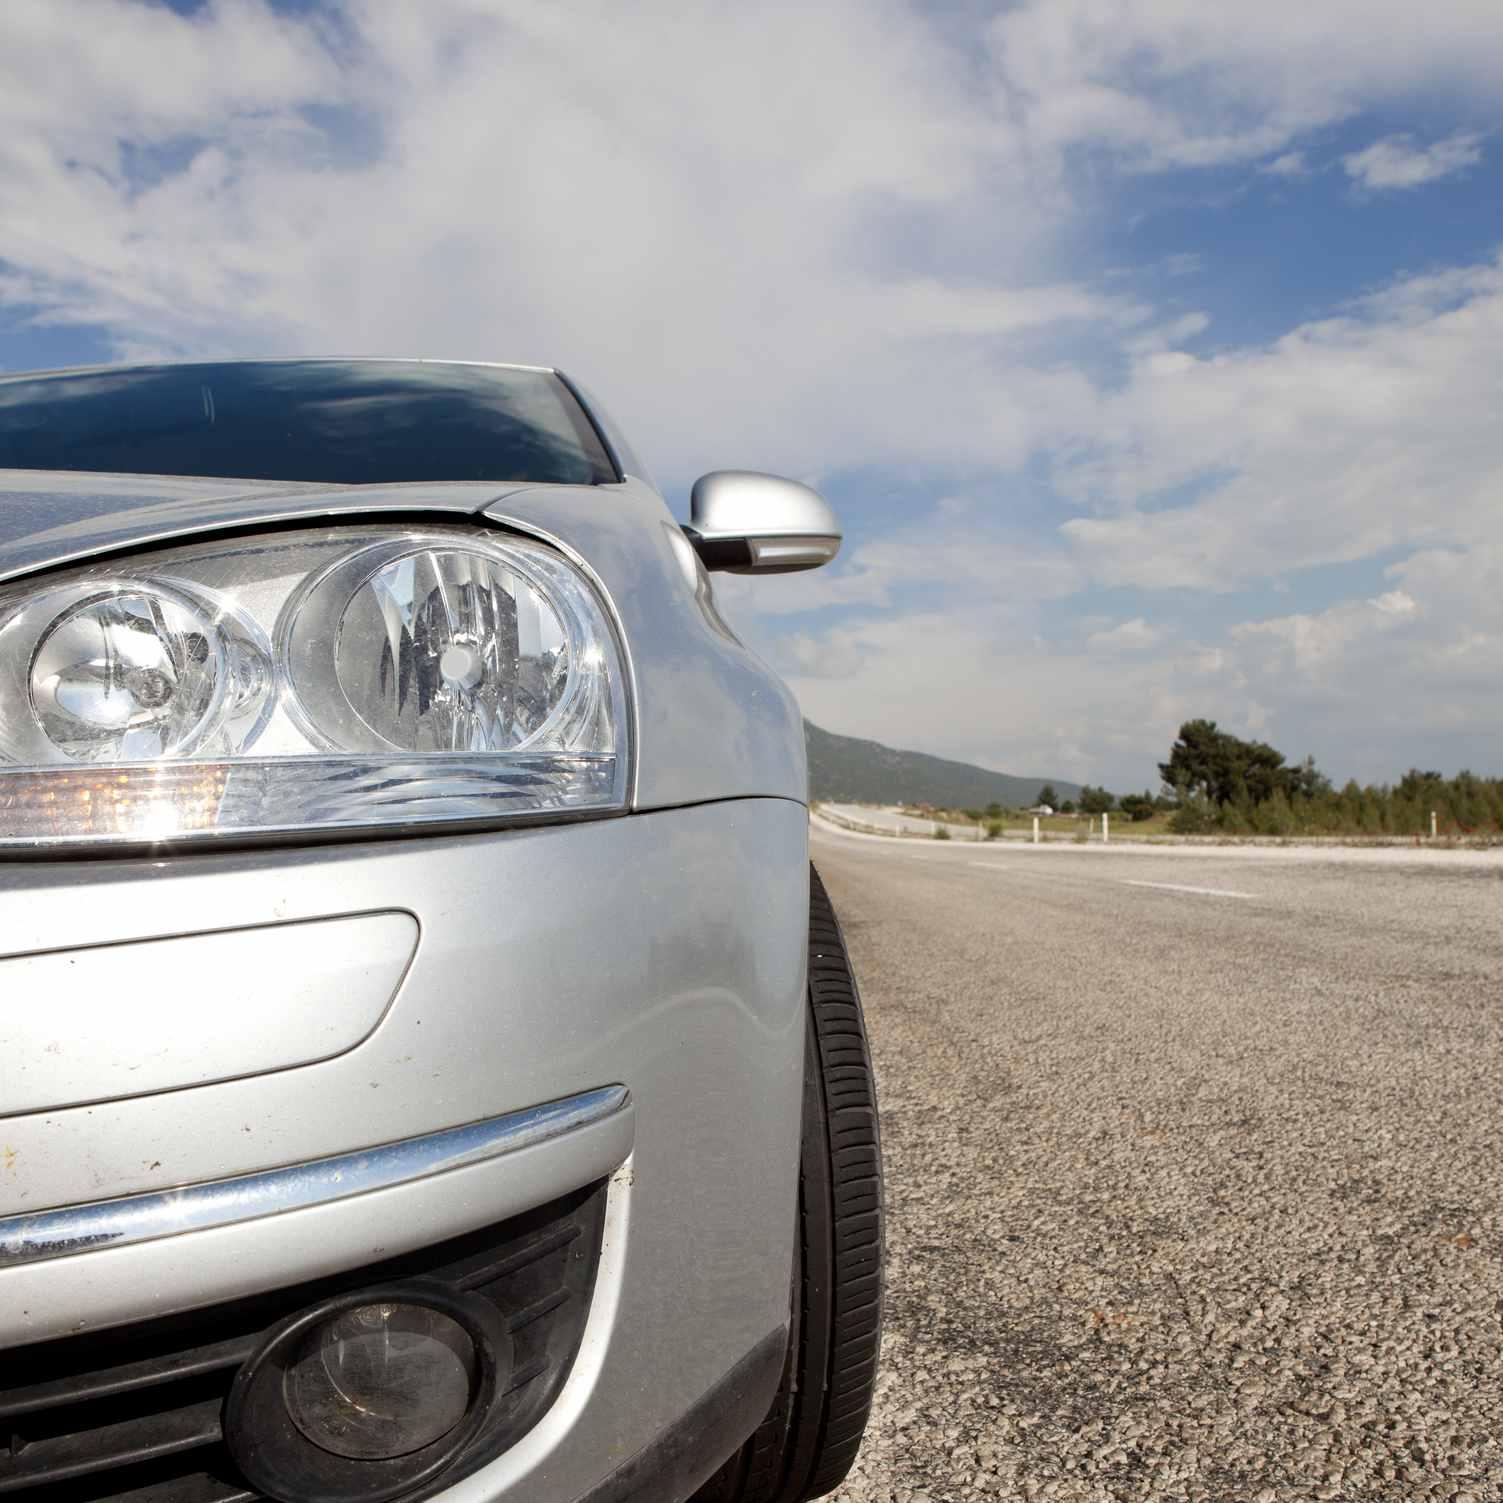 Closeup of a car headlight